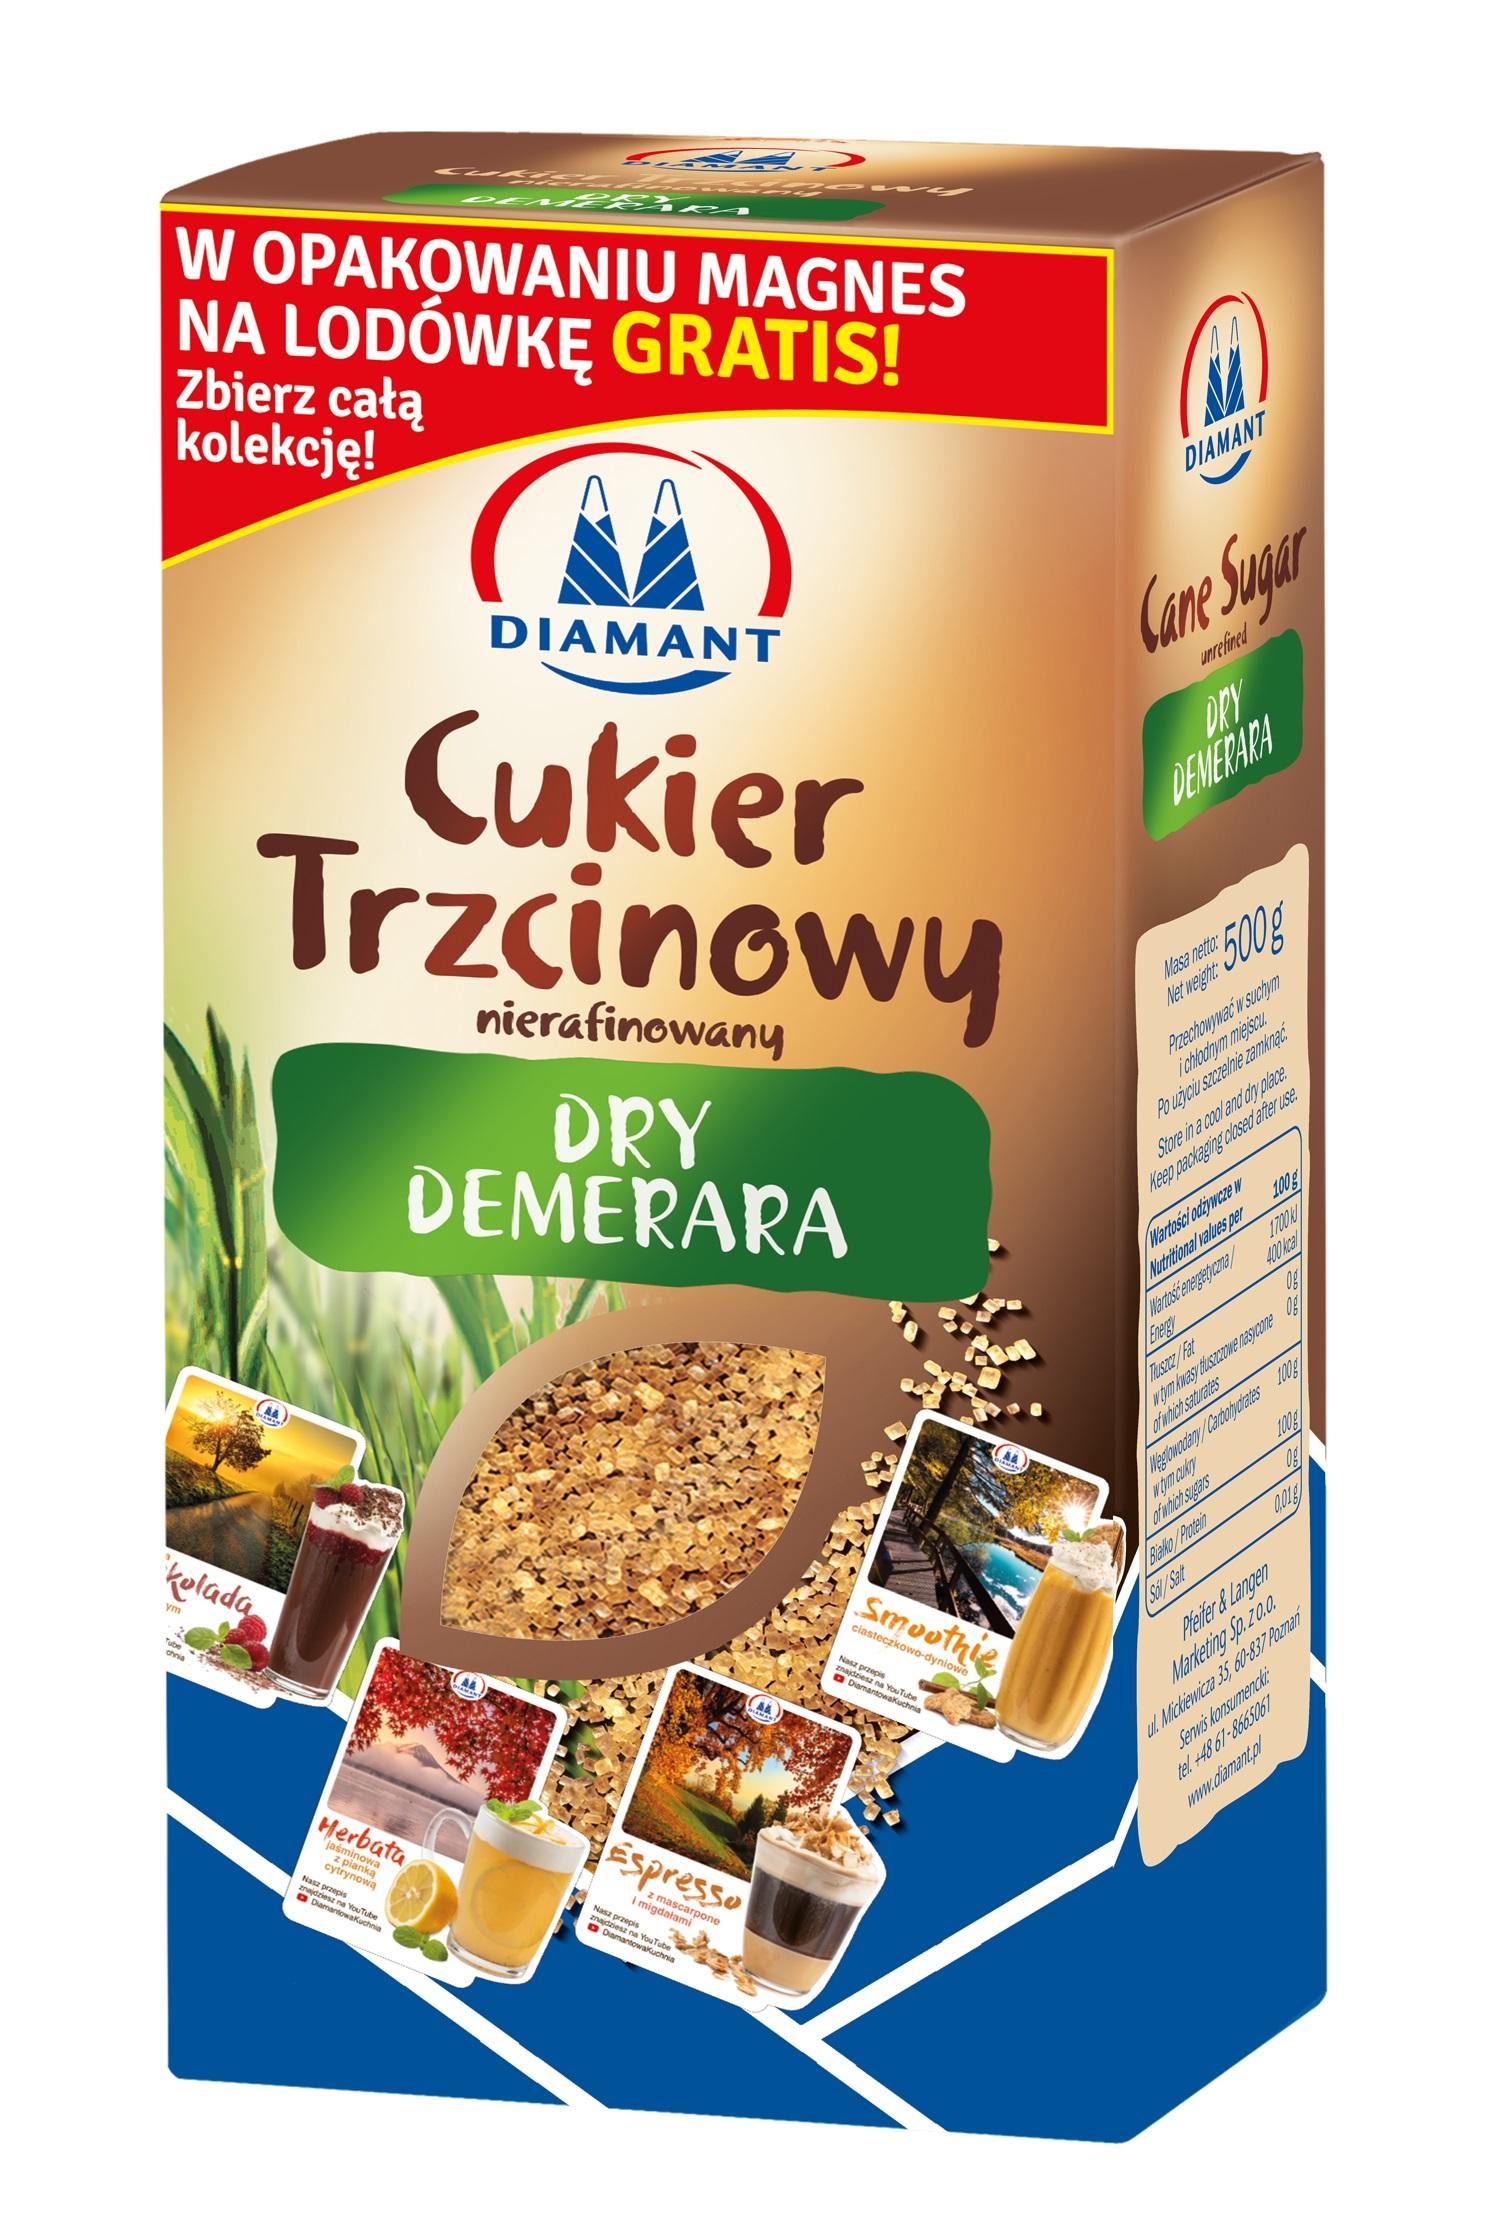 Cukier Dry Demerara marki Diament